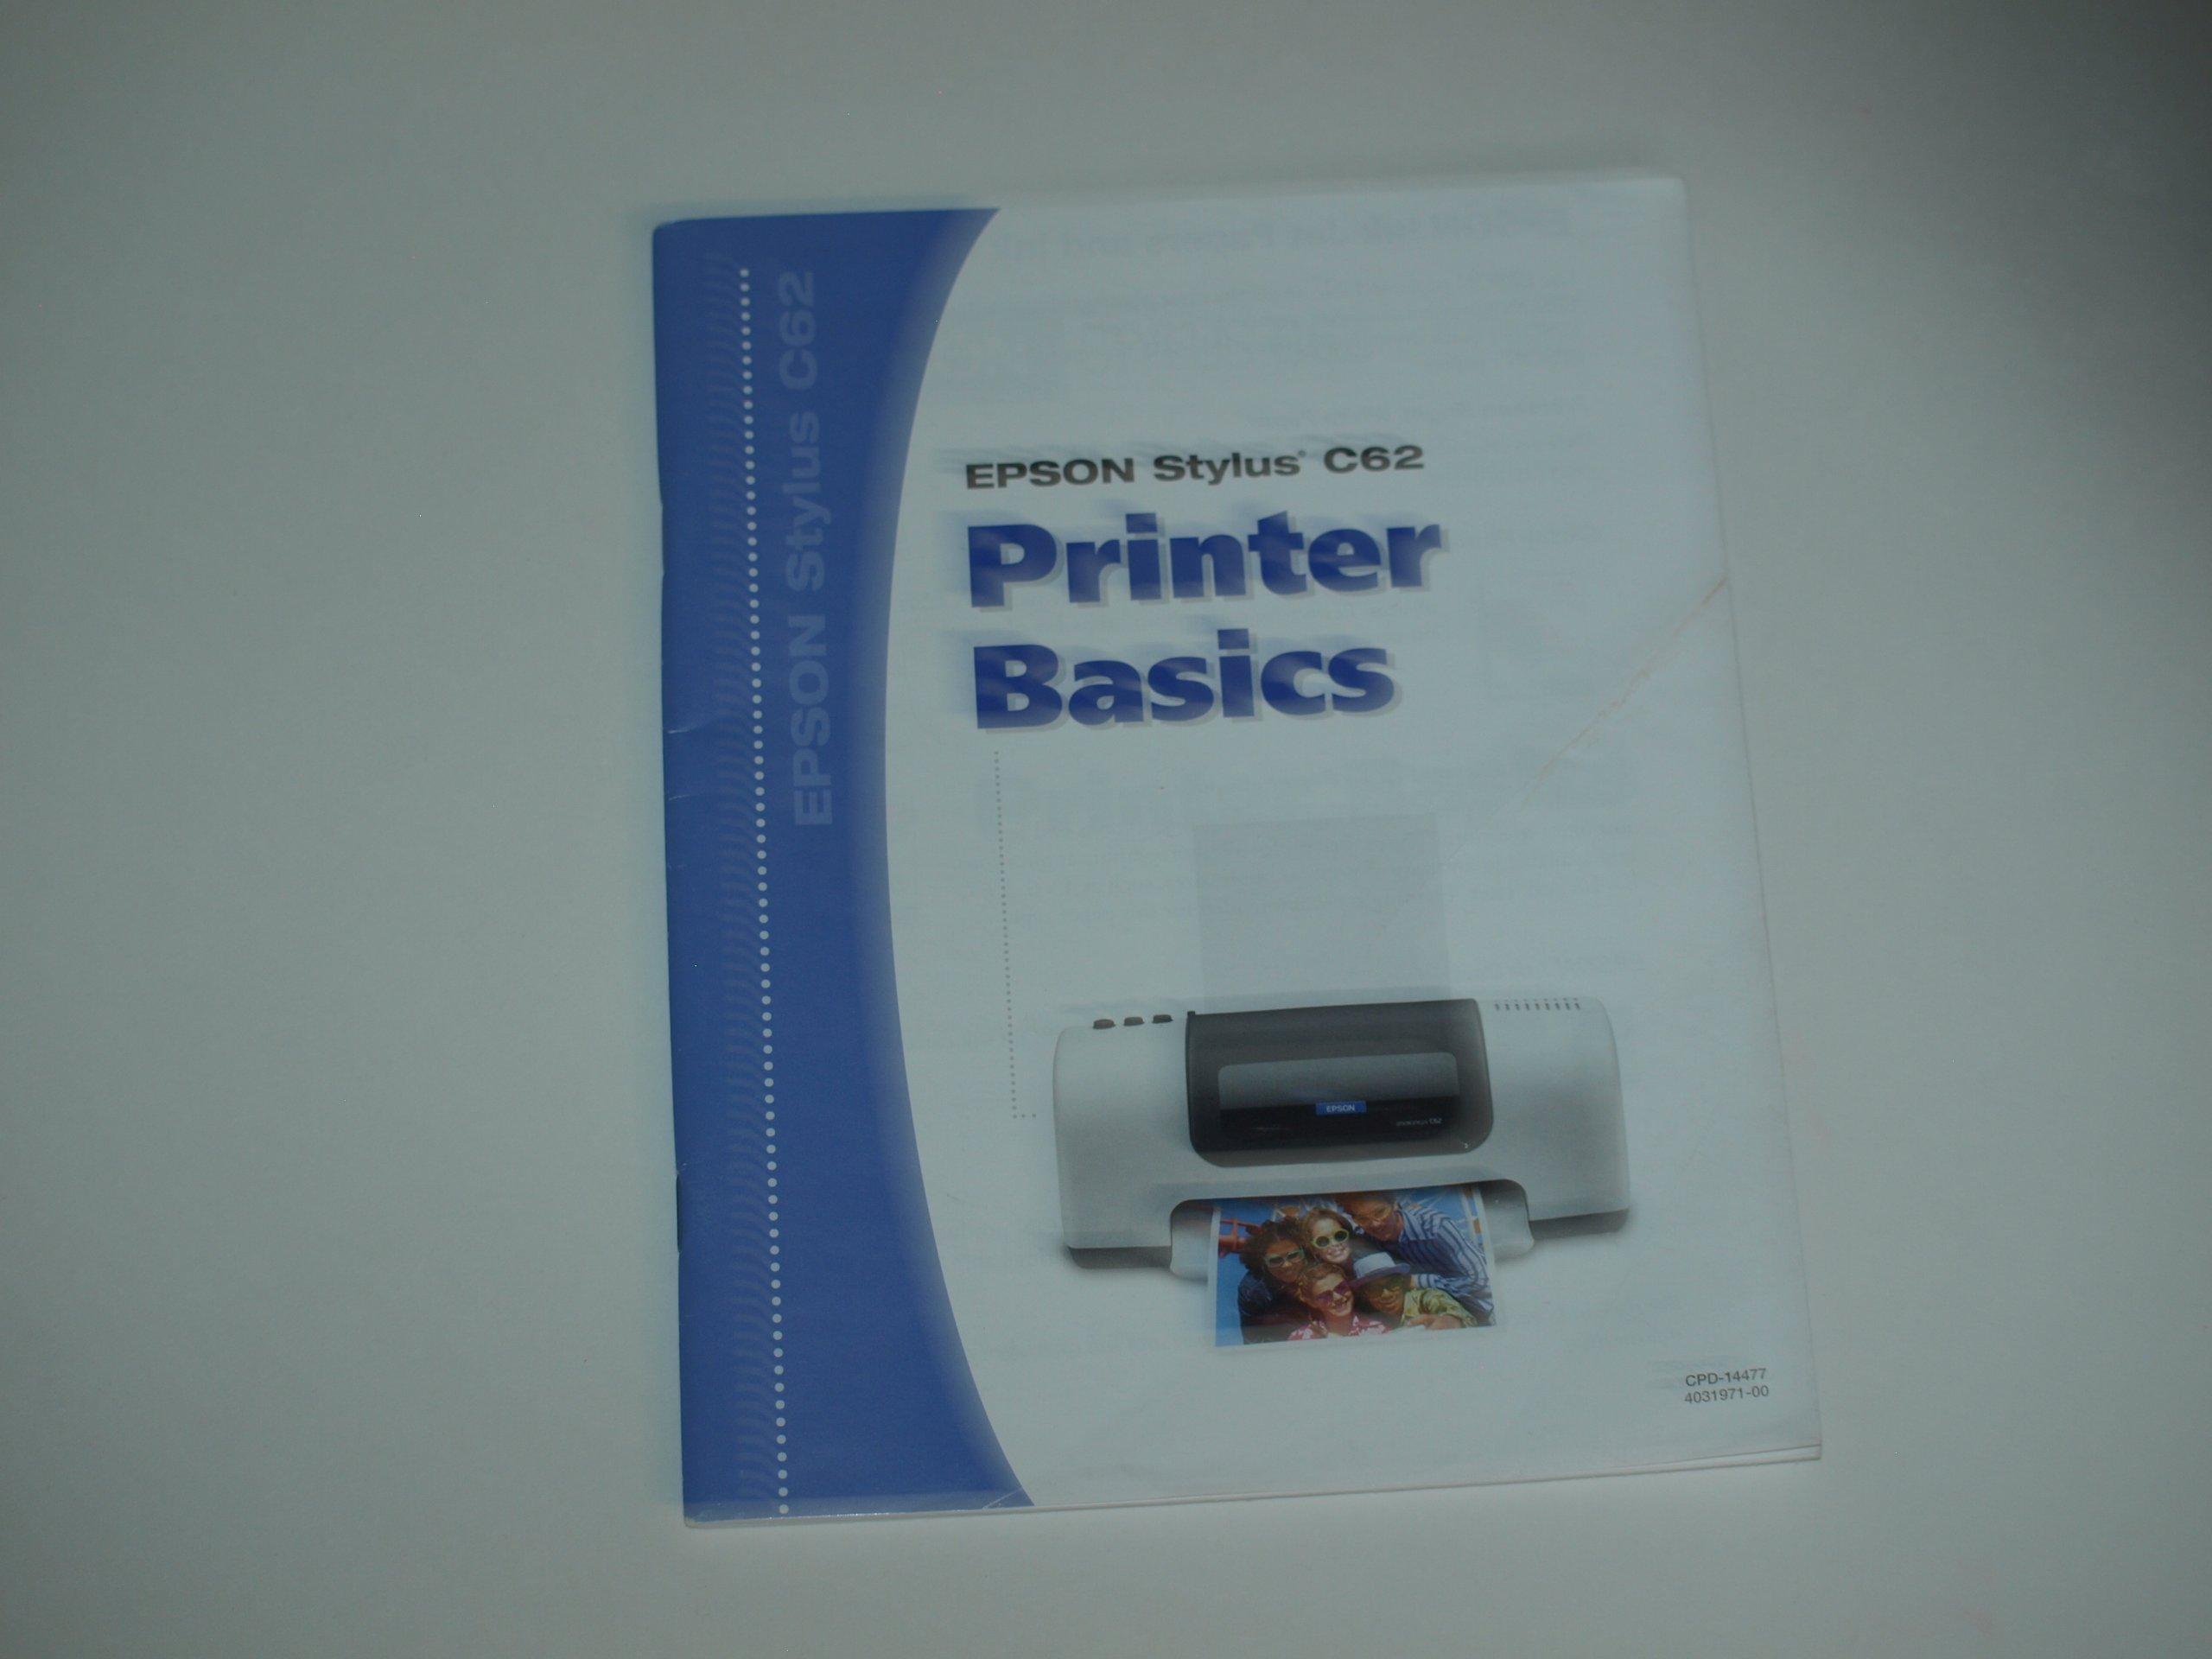 epson stylus c62 printer manual guide basic manual epson rh amazon com epson stylus c62 service manual Epson Stylus Ink Cartridges